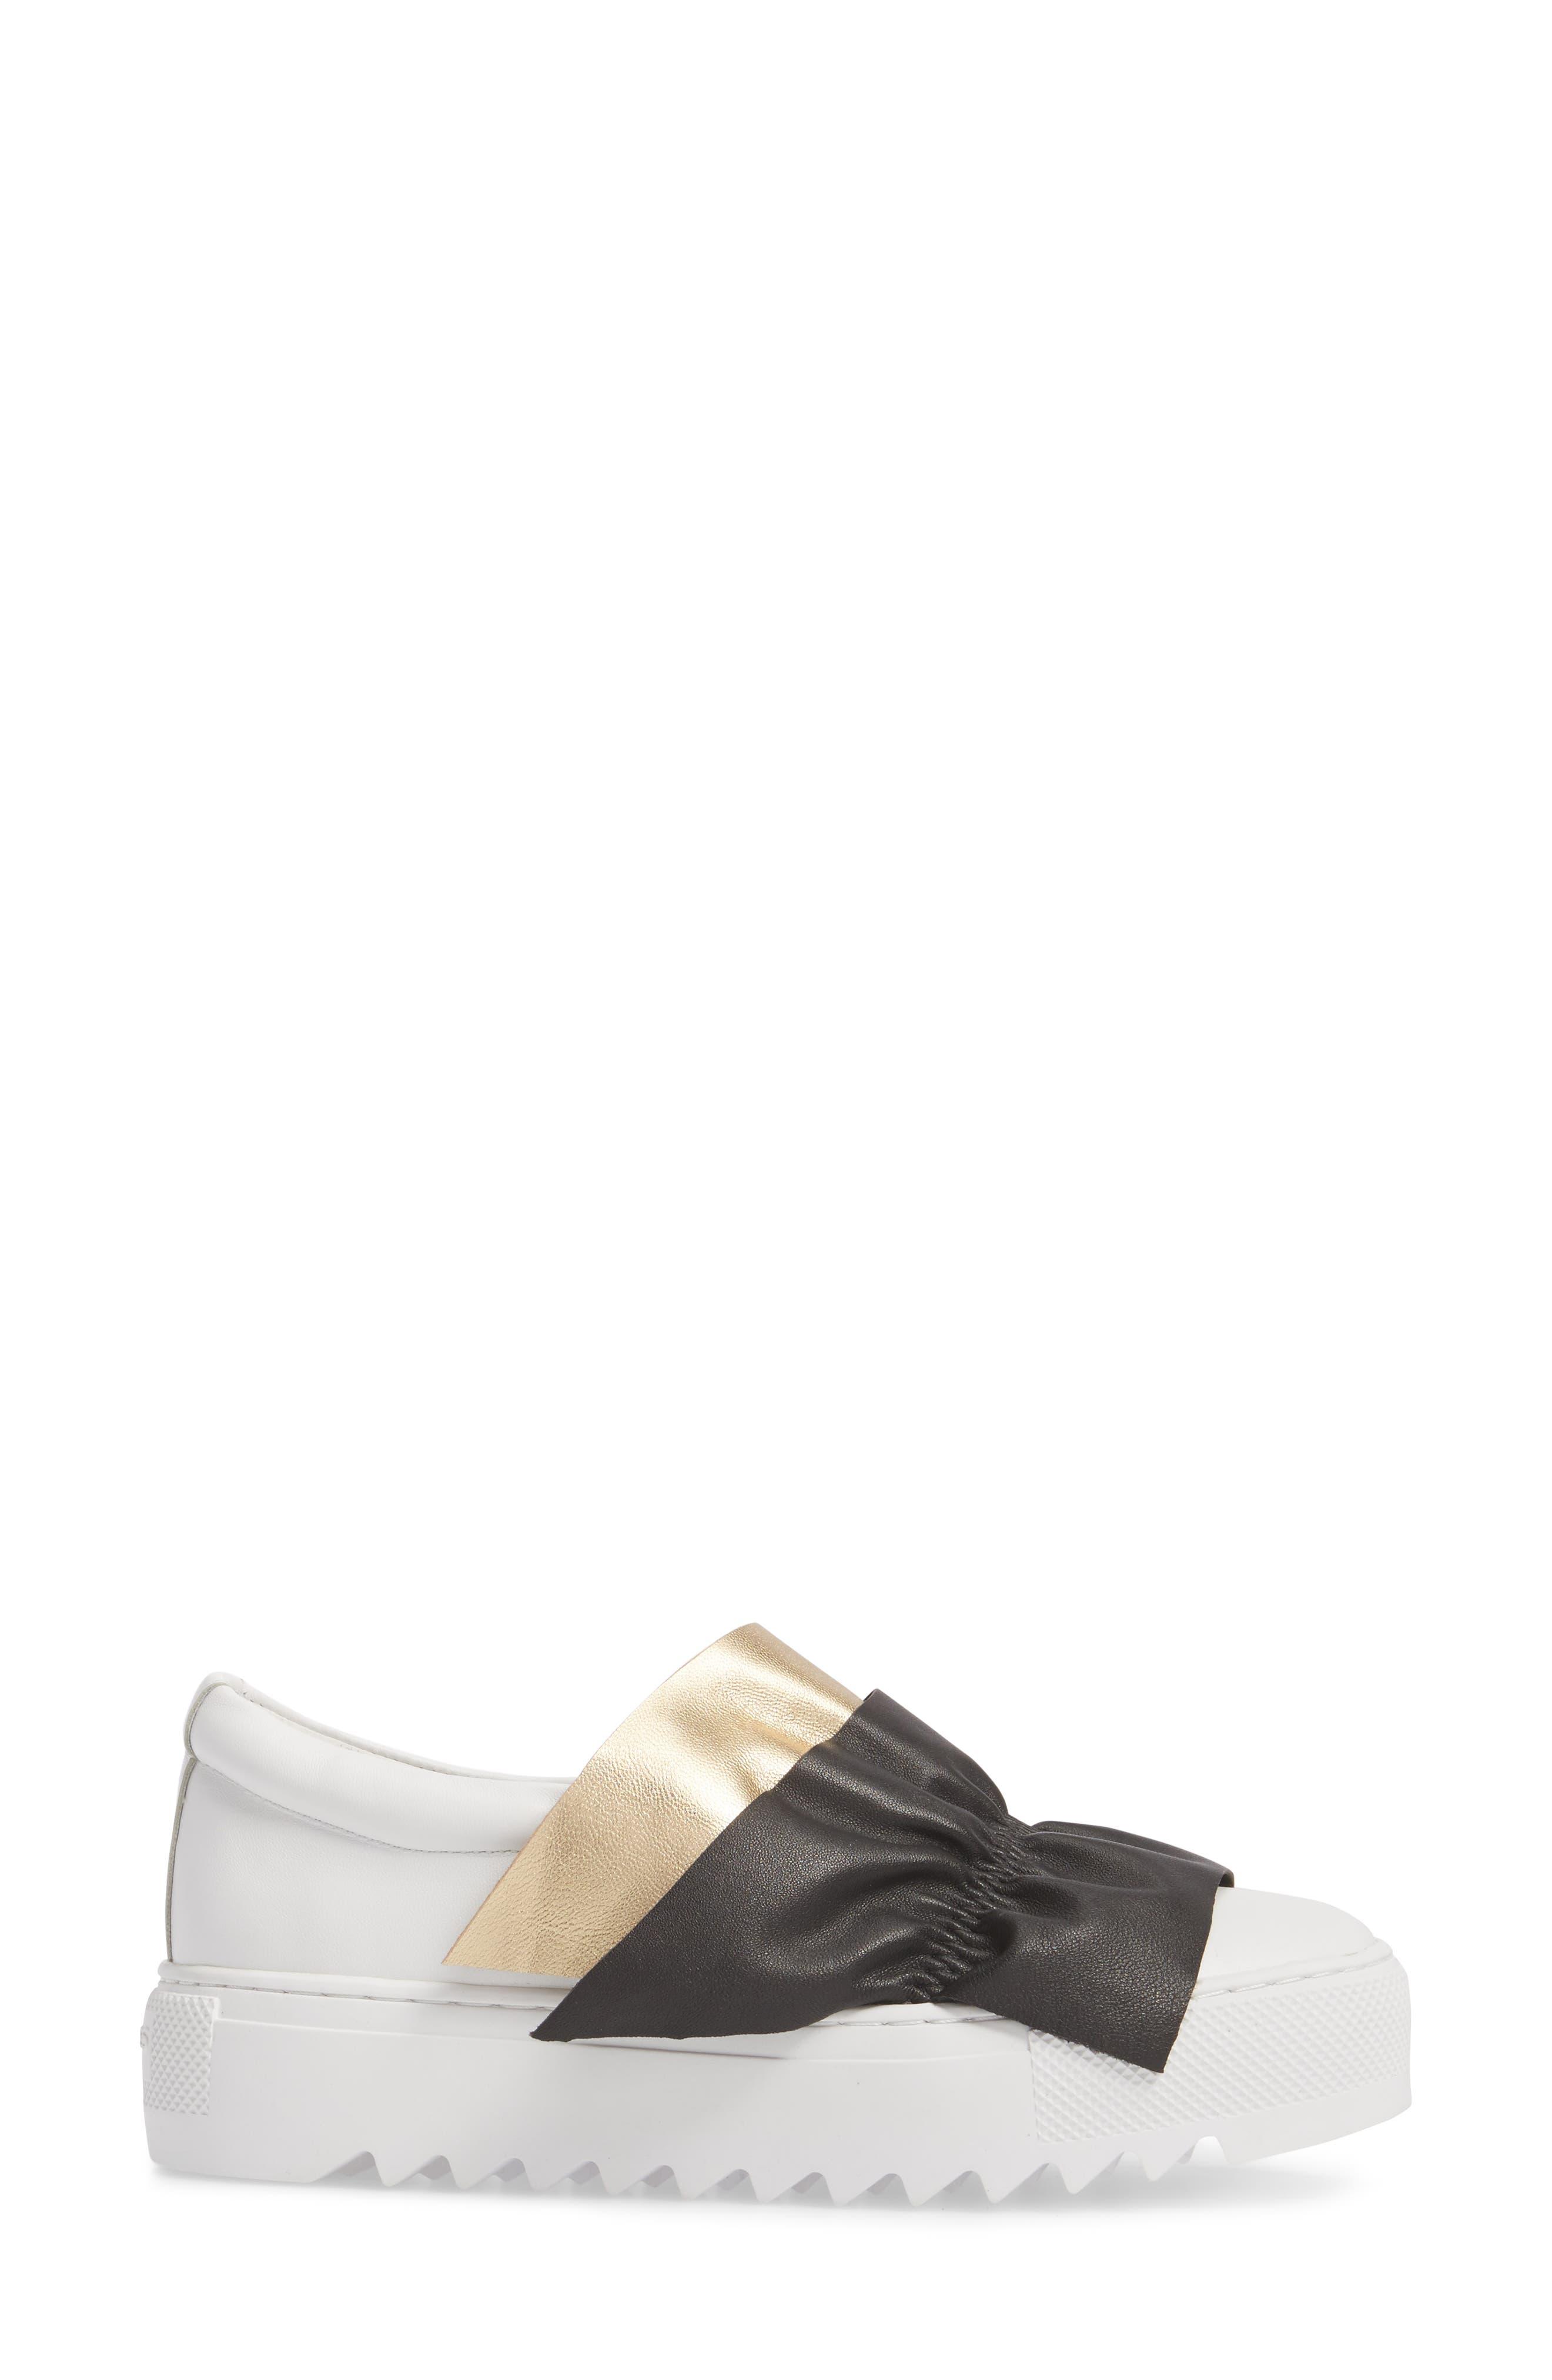 Sadie Ruffle Platform Sneaker,                             Alternate thumbnail 3, color,                             WHITE LEATHER